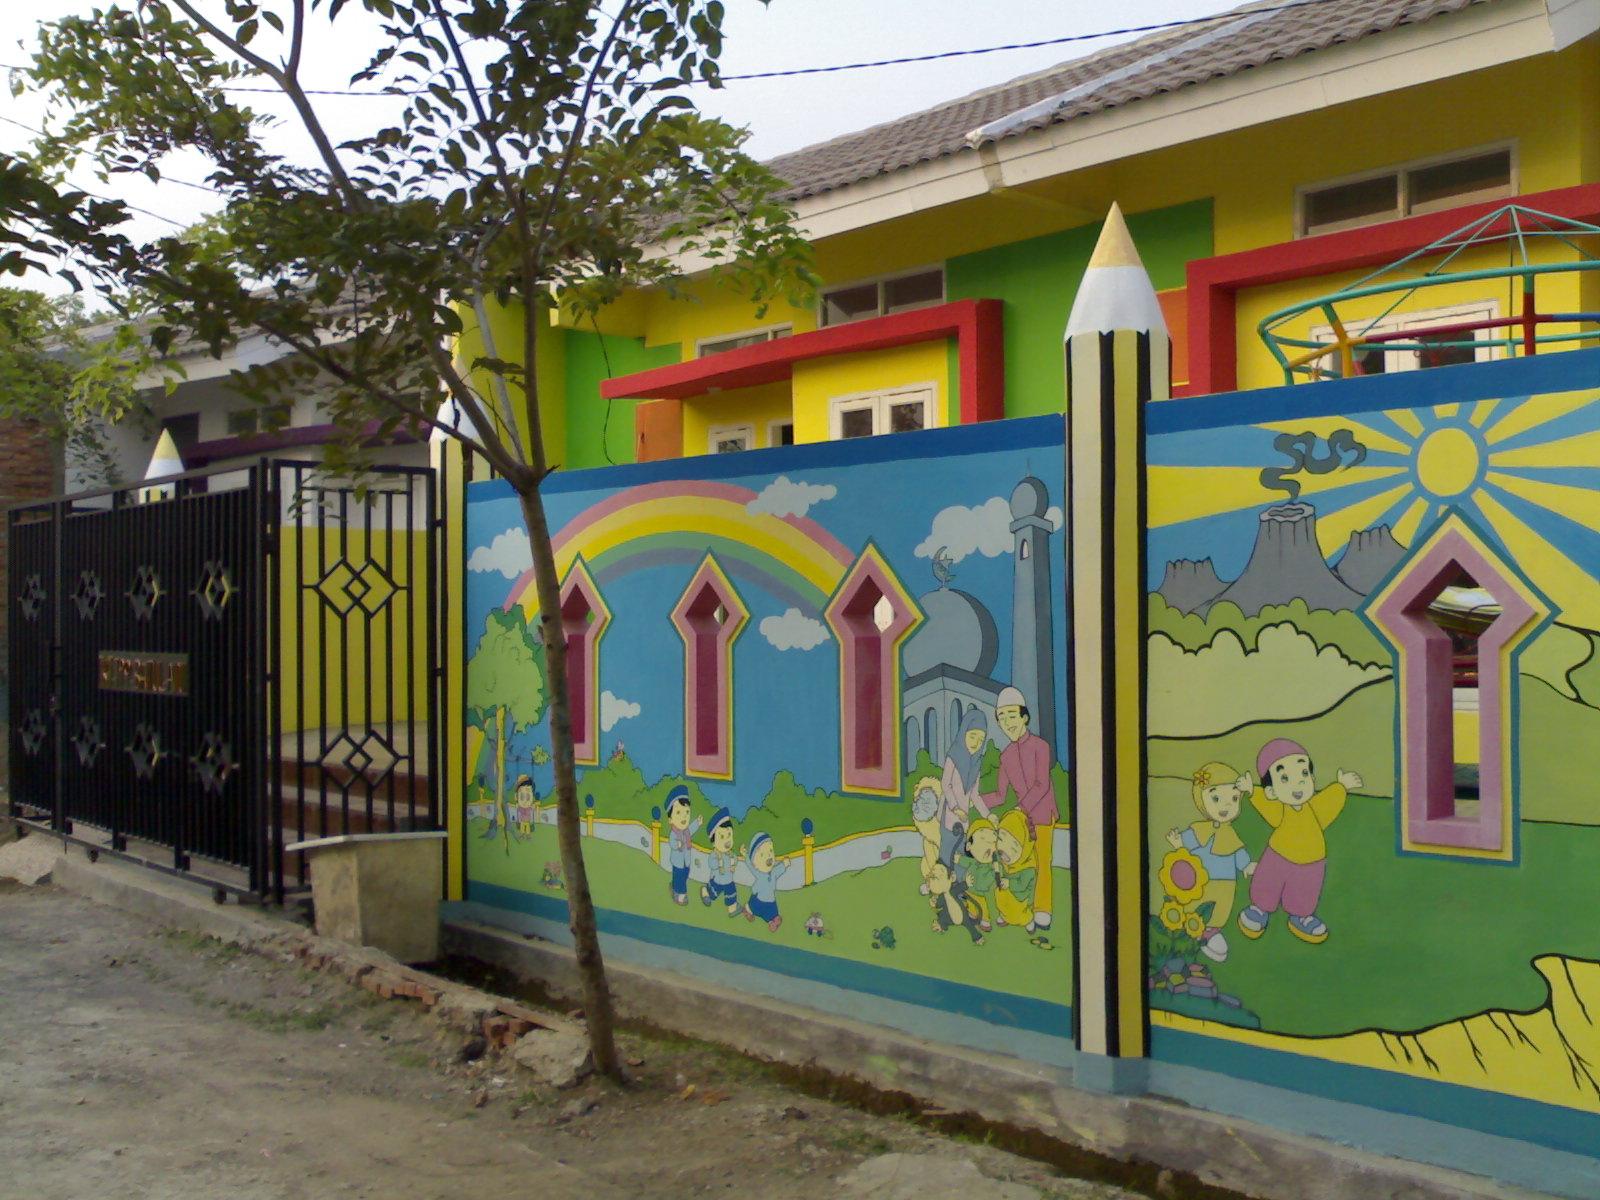 Tkit tpq baitul 39 aini maret 2012 for Mural untuk kanak kanak